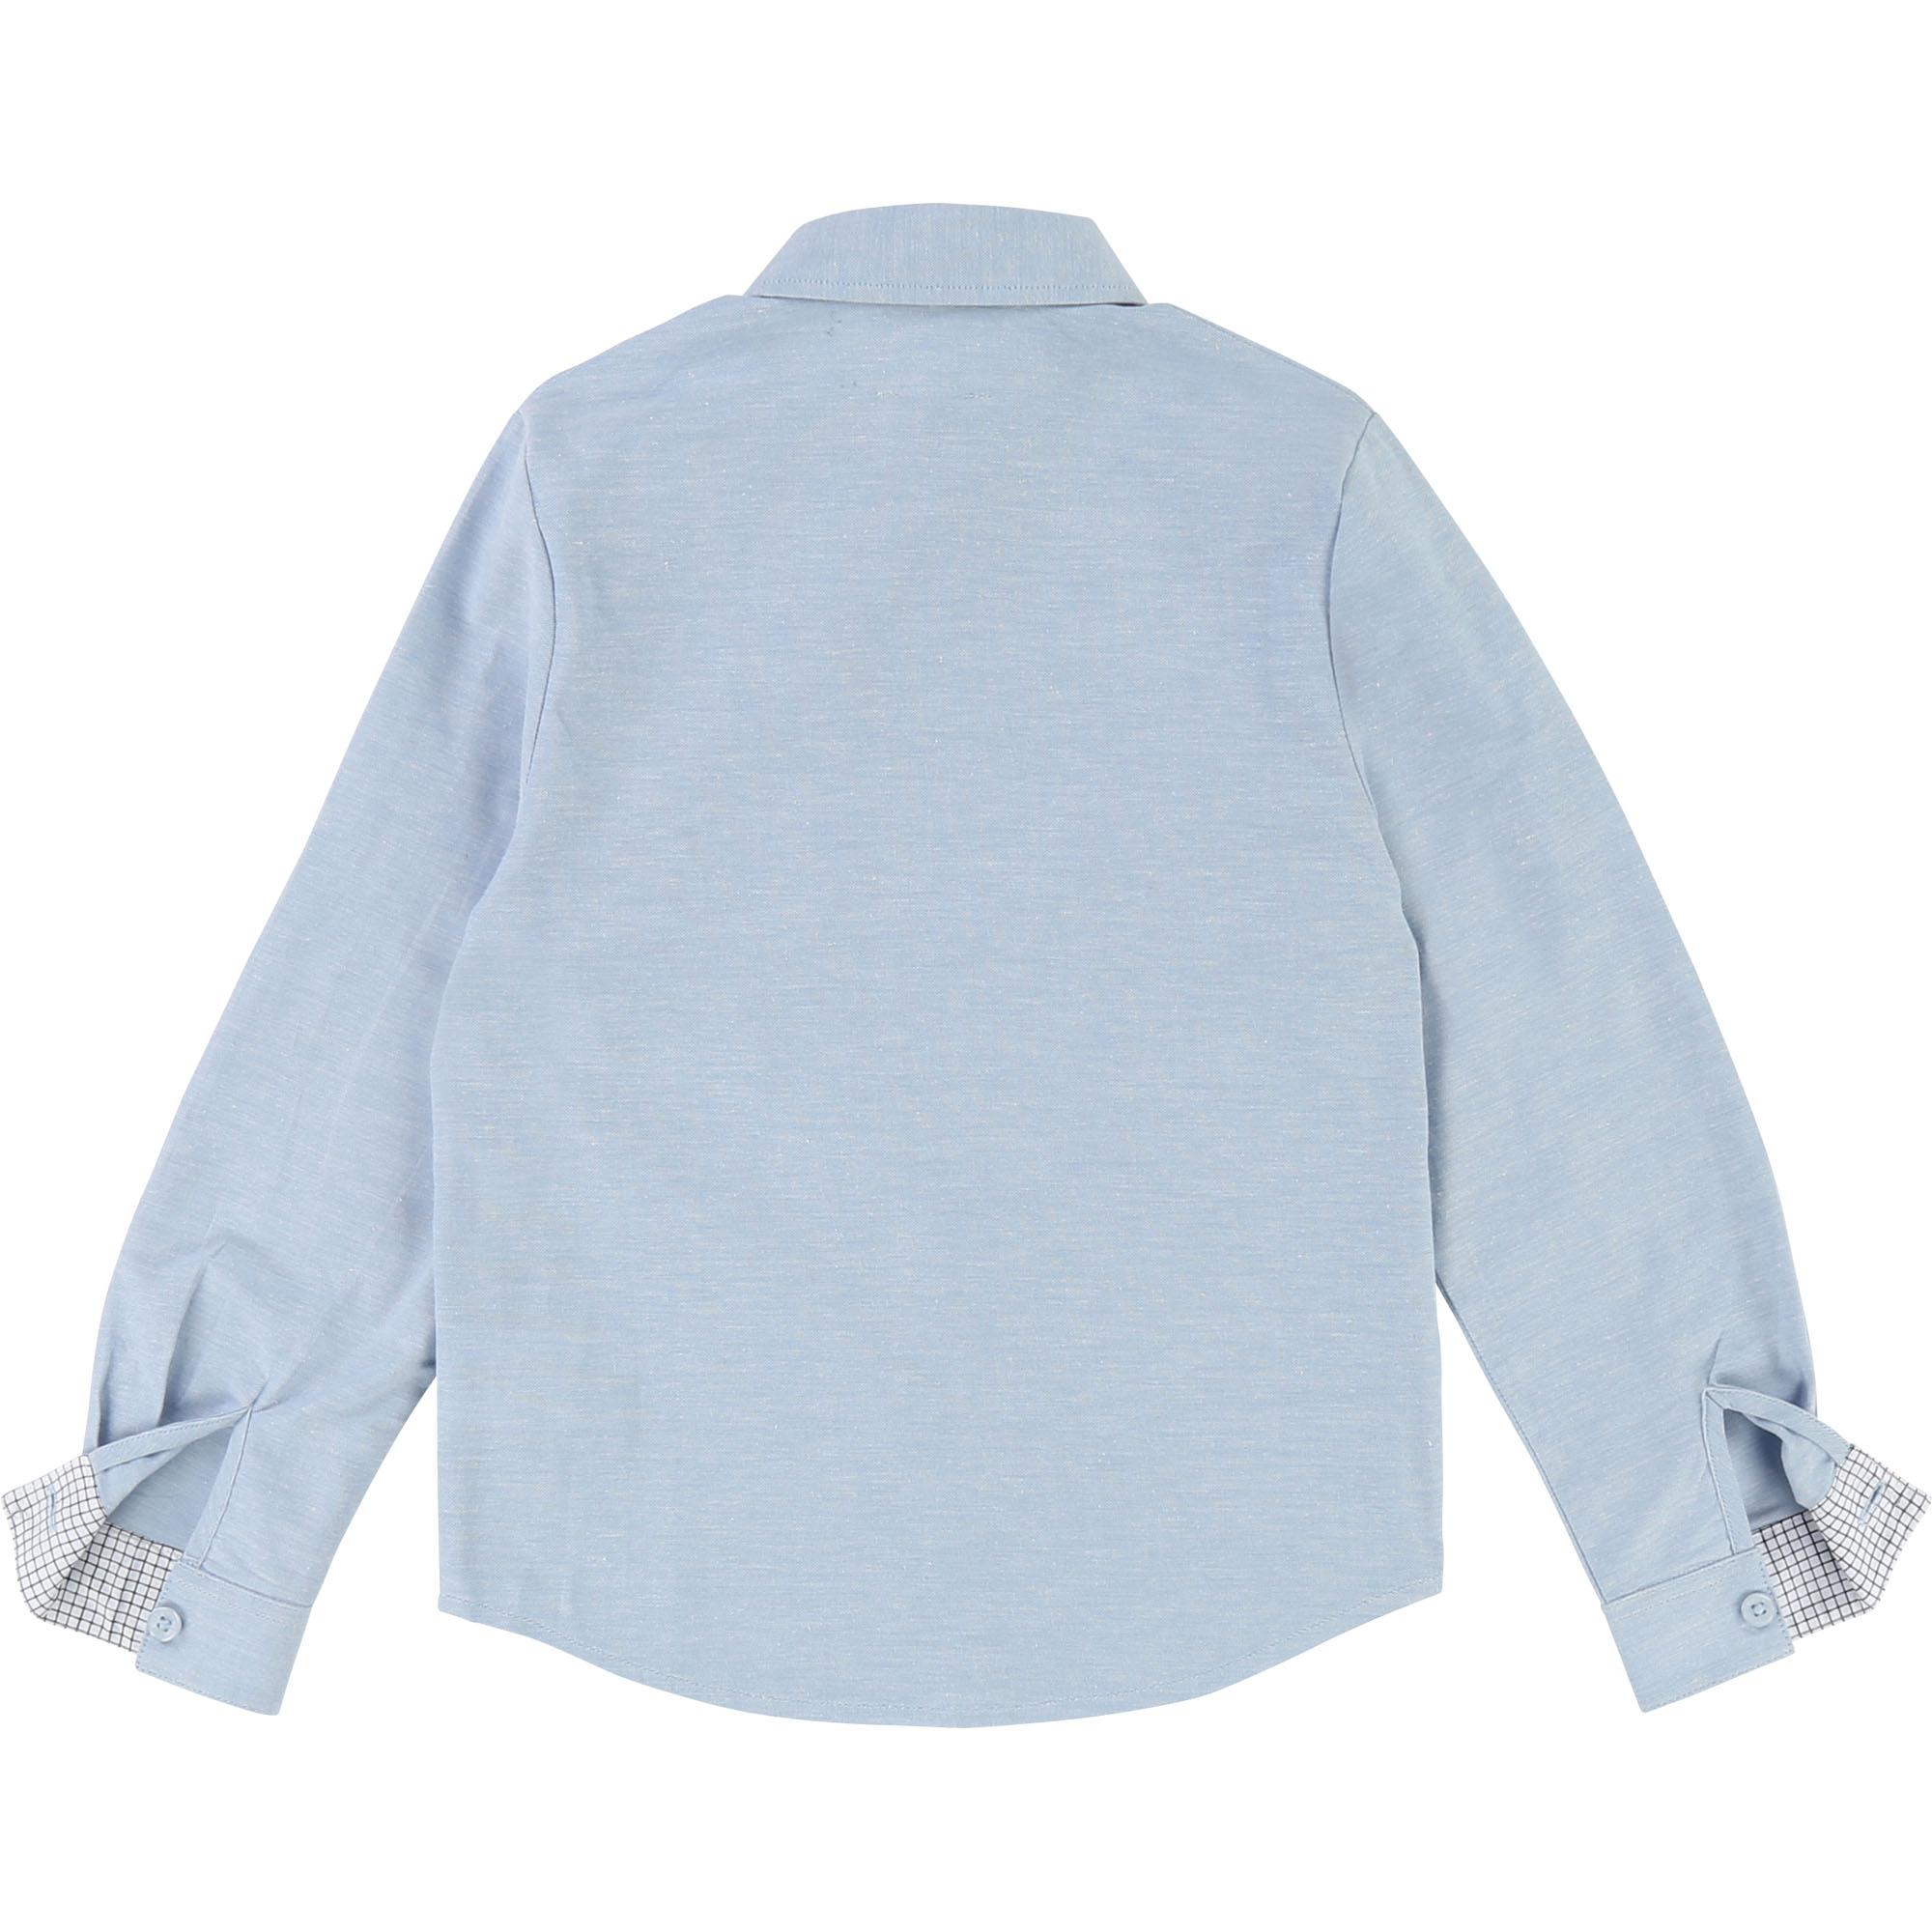 Carrement Beau v-sininen kauluspaita koko 102 cm, 114 cm, 138cm ja 150 cm ALE -50% (OVH 39€)